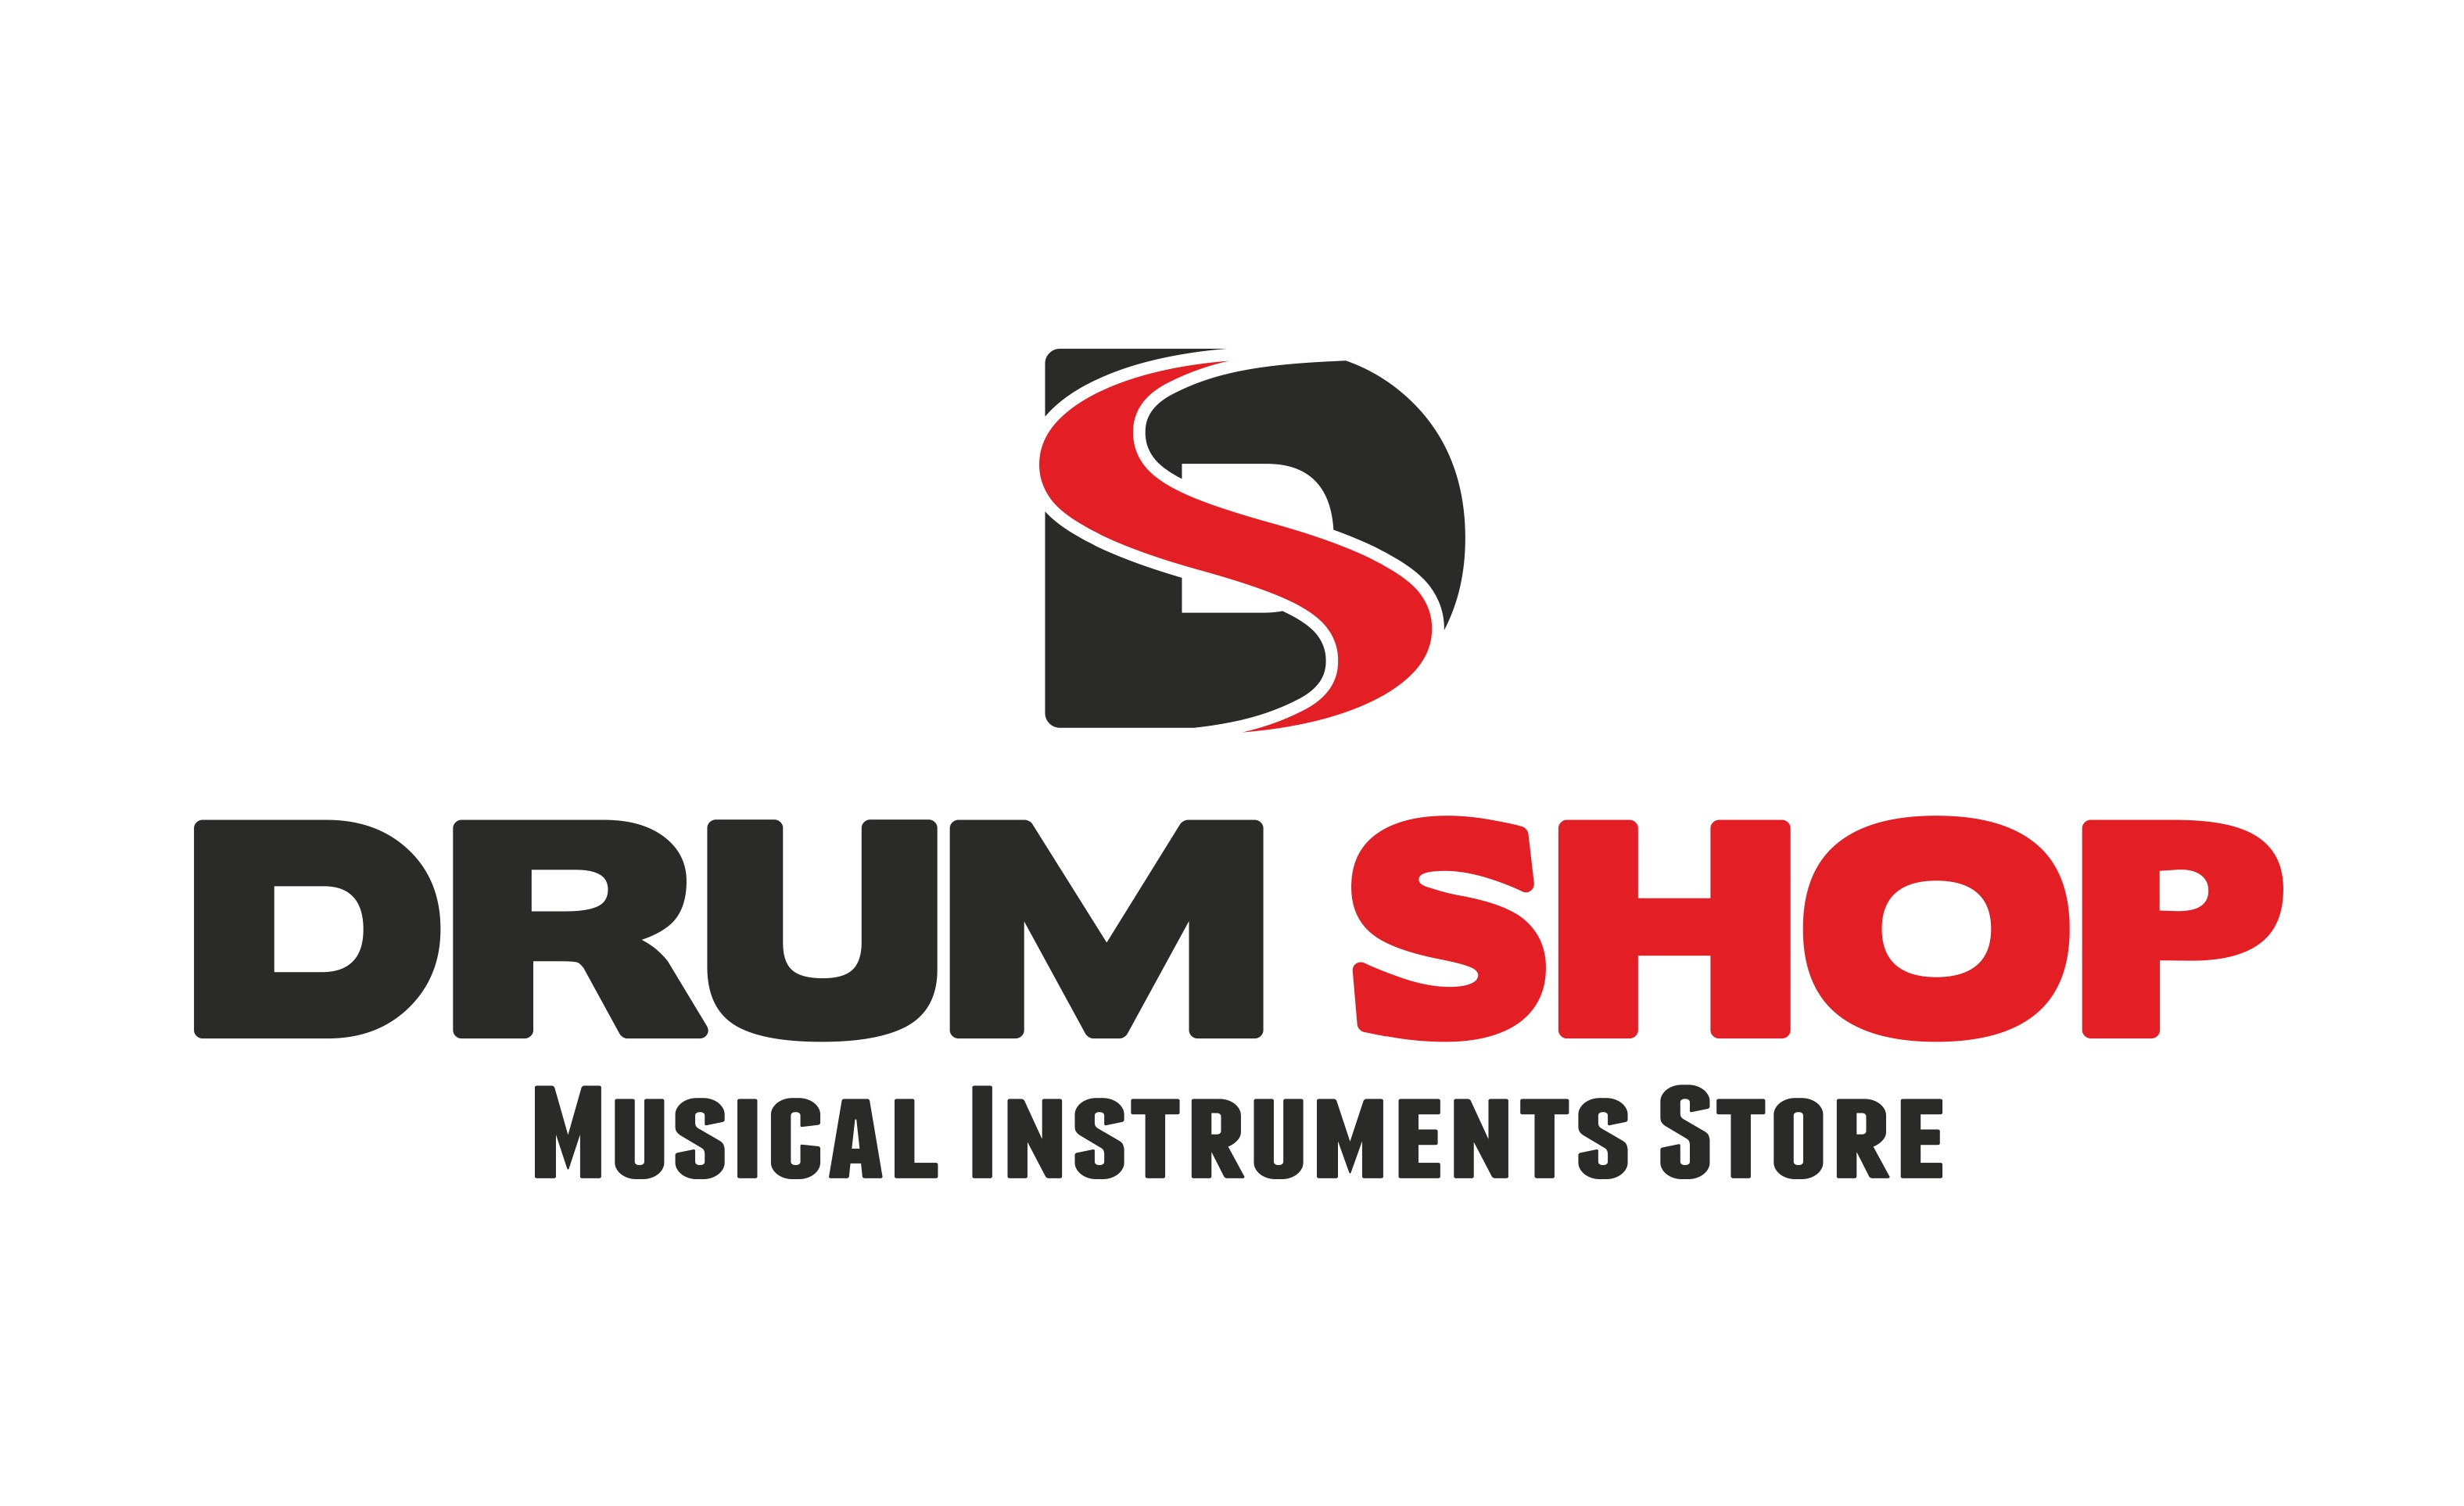 DRUM SHOP MUSICAL INSTRUMENT STORE